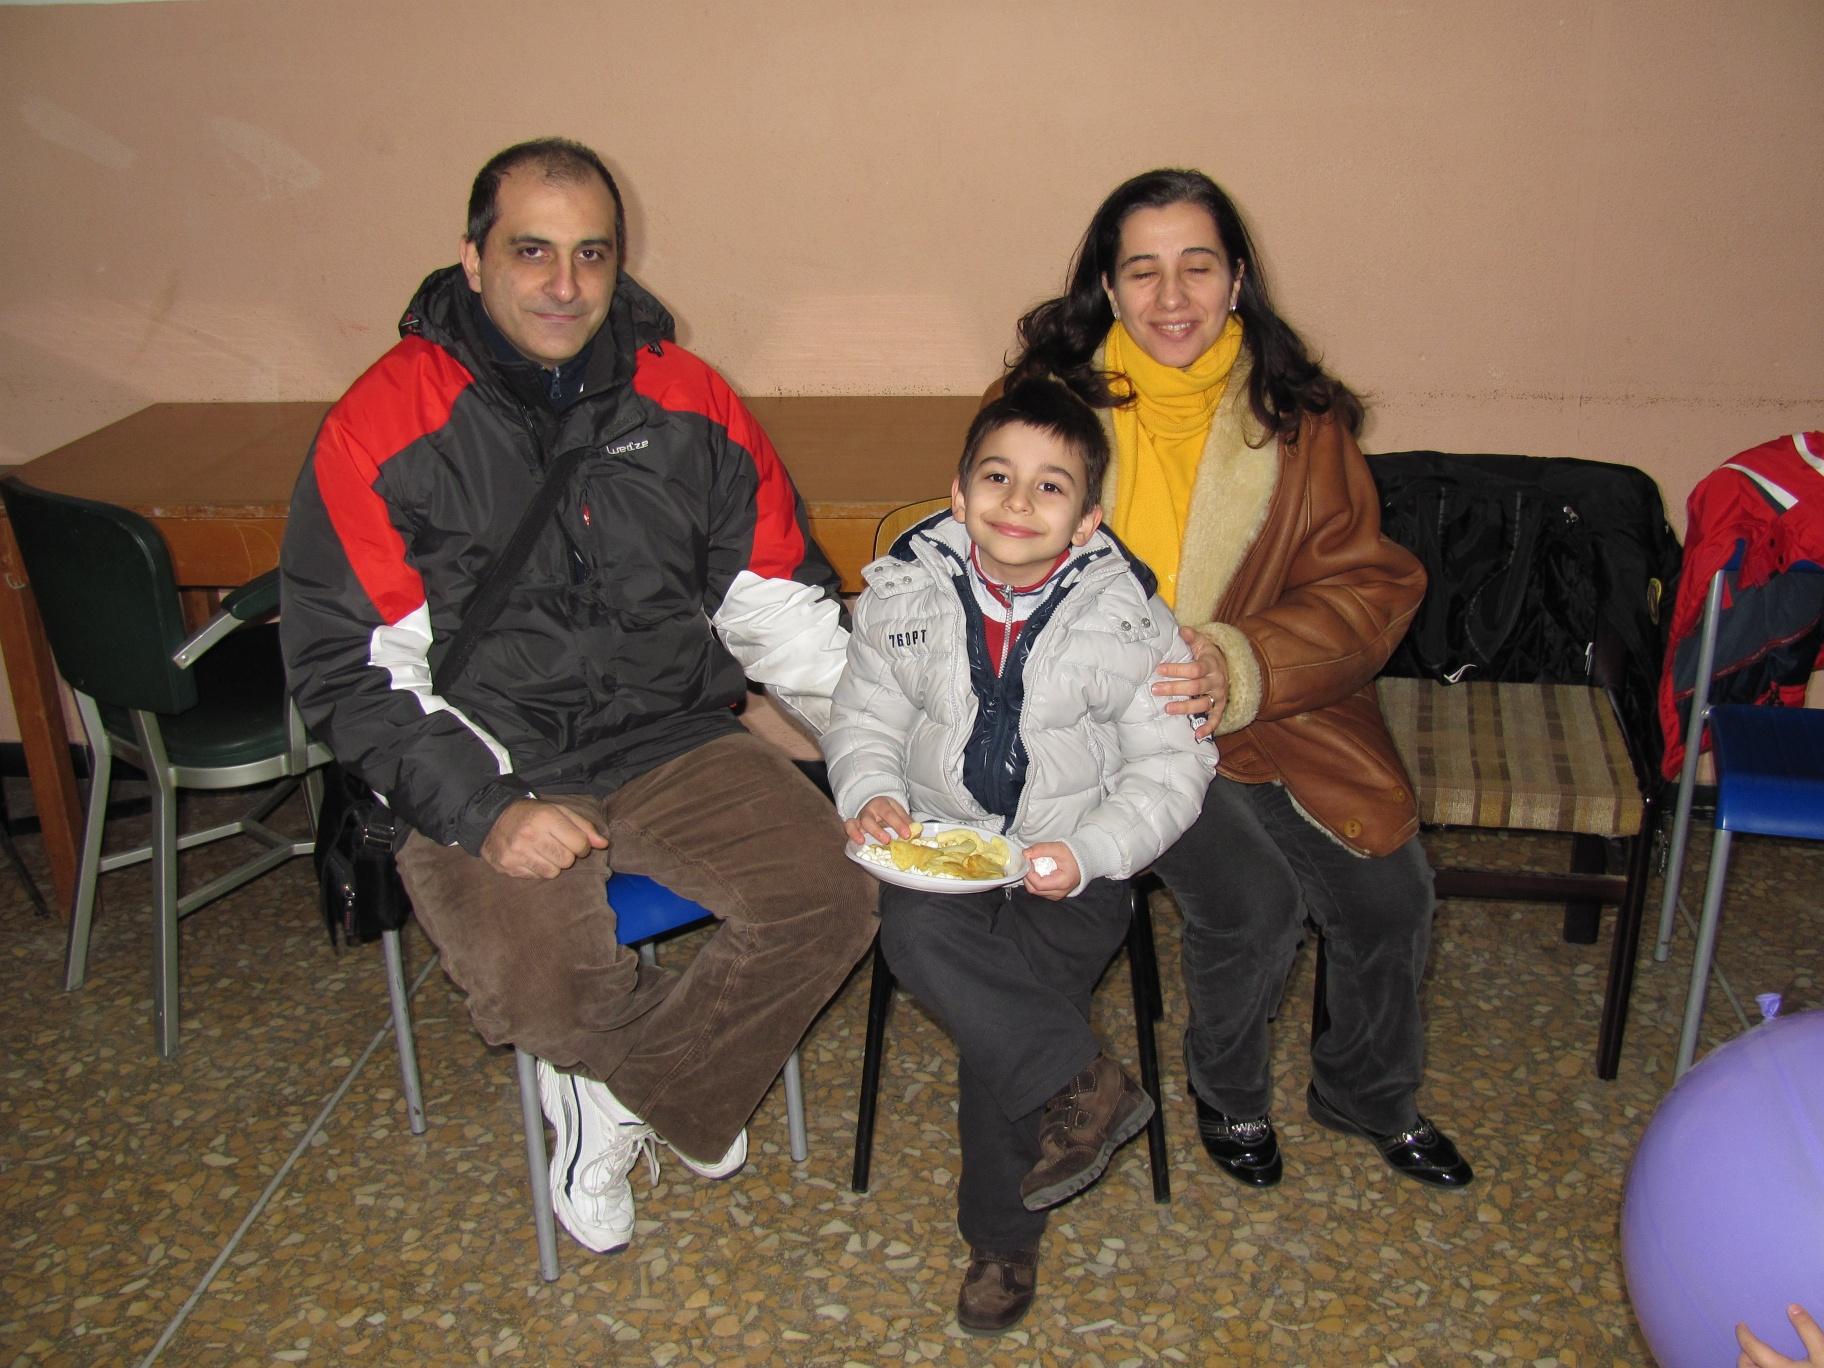 ricordo_battesimo_gesu_2011-01-23-16-39-53